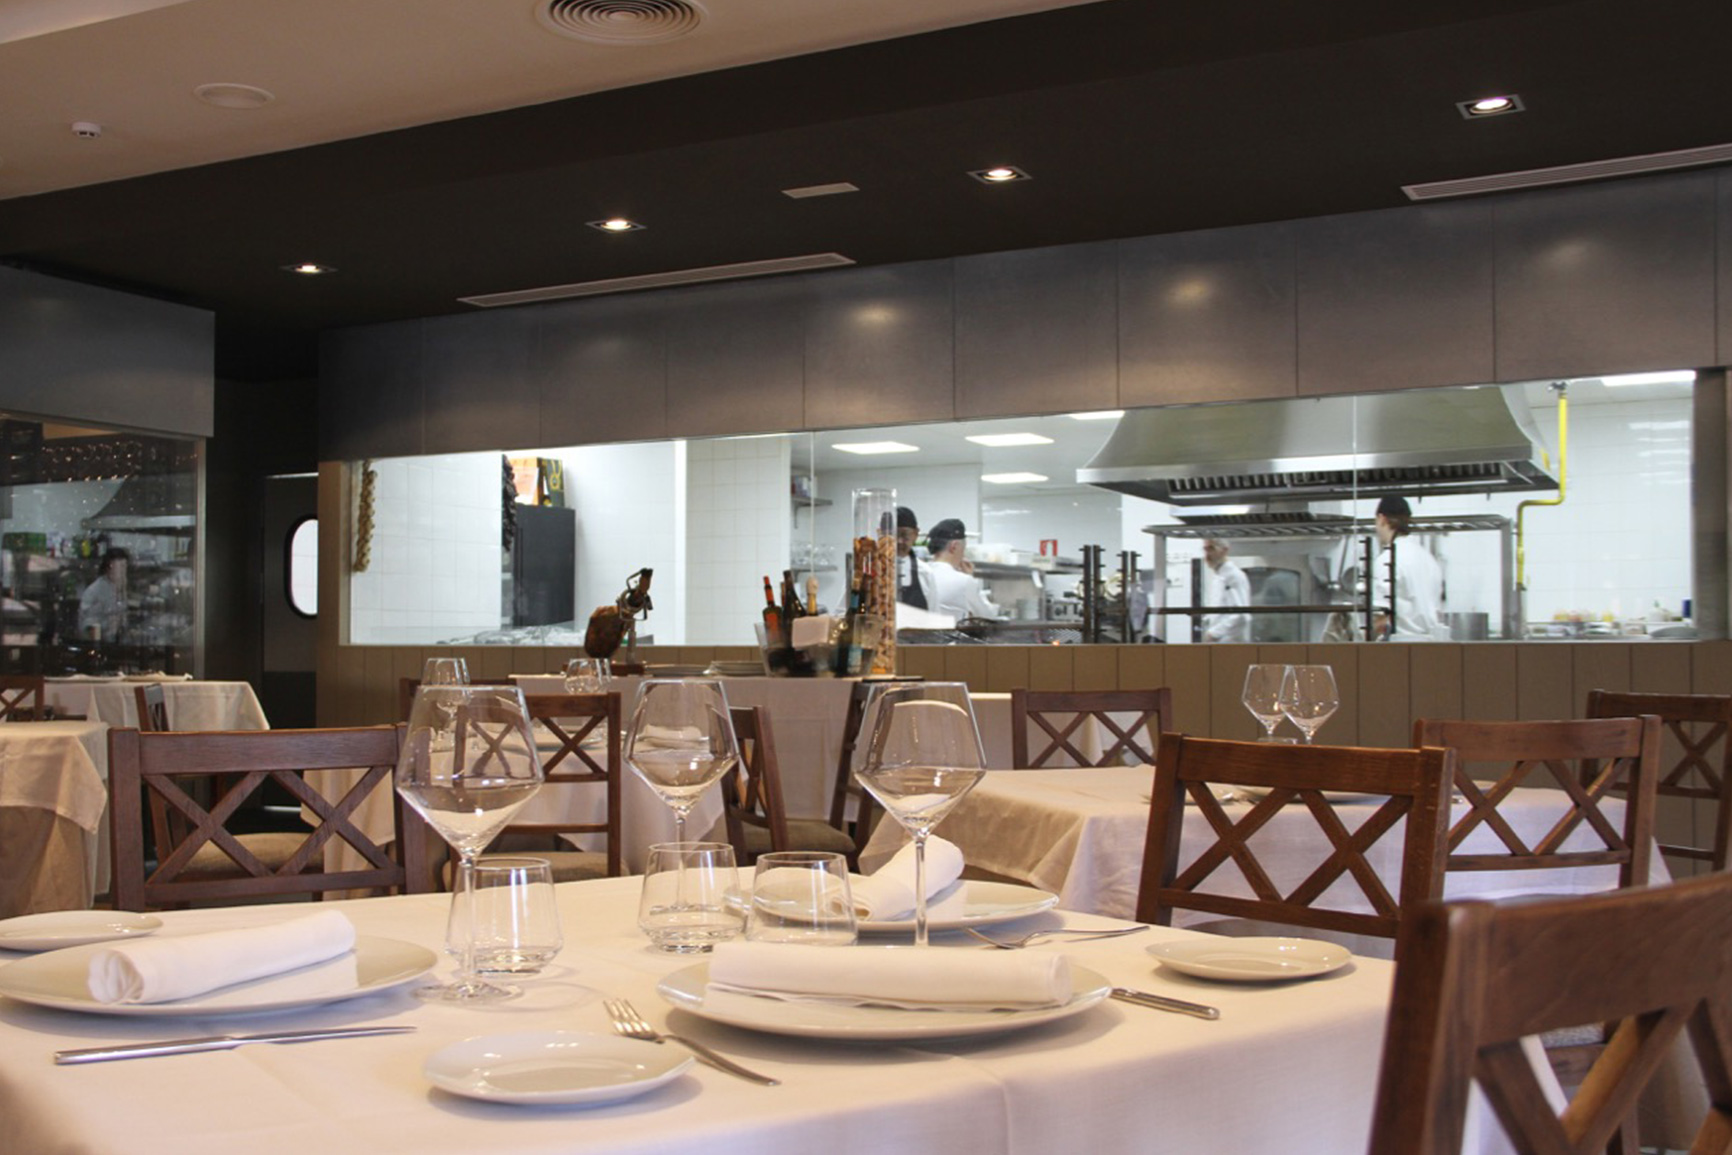 Restaurantes grupo el pradal for Restaurante italiano san sebastian de los reyes